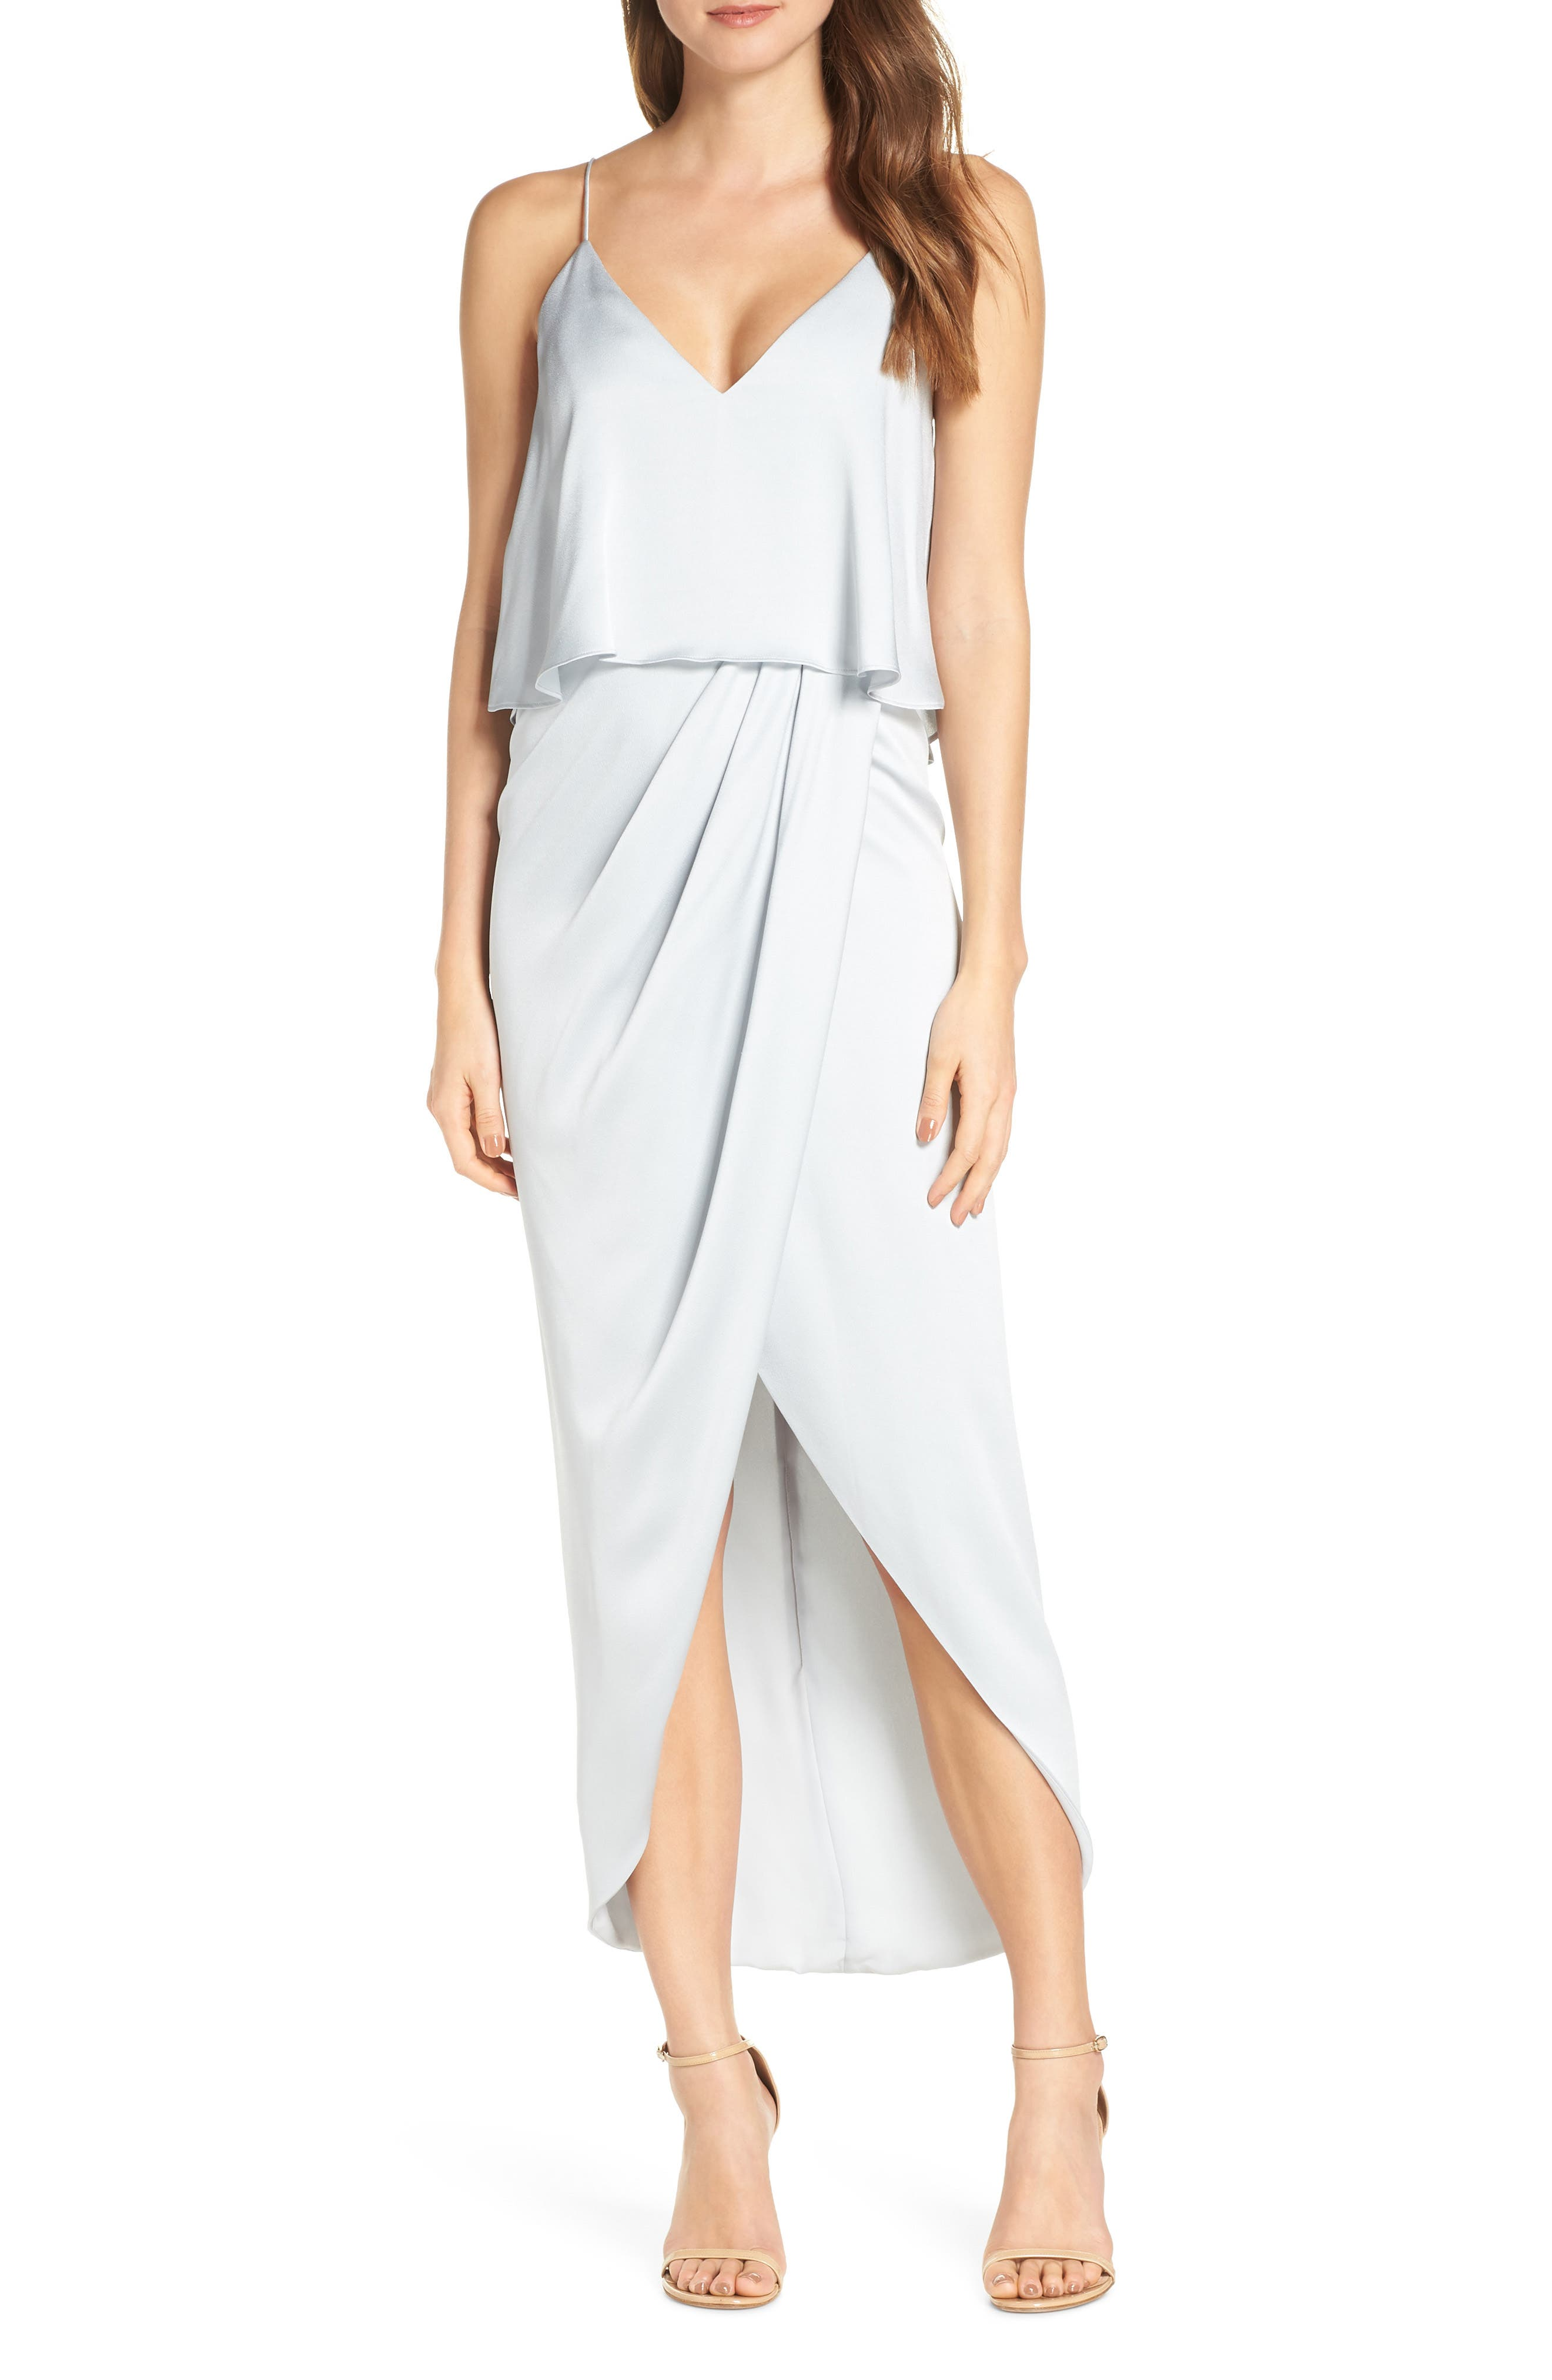 SHONA JOY Luxe Frill Tulip Hem Maxi Dress, Main, color, CLOUD